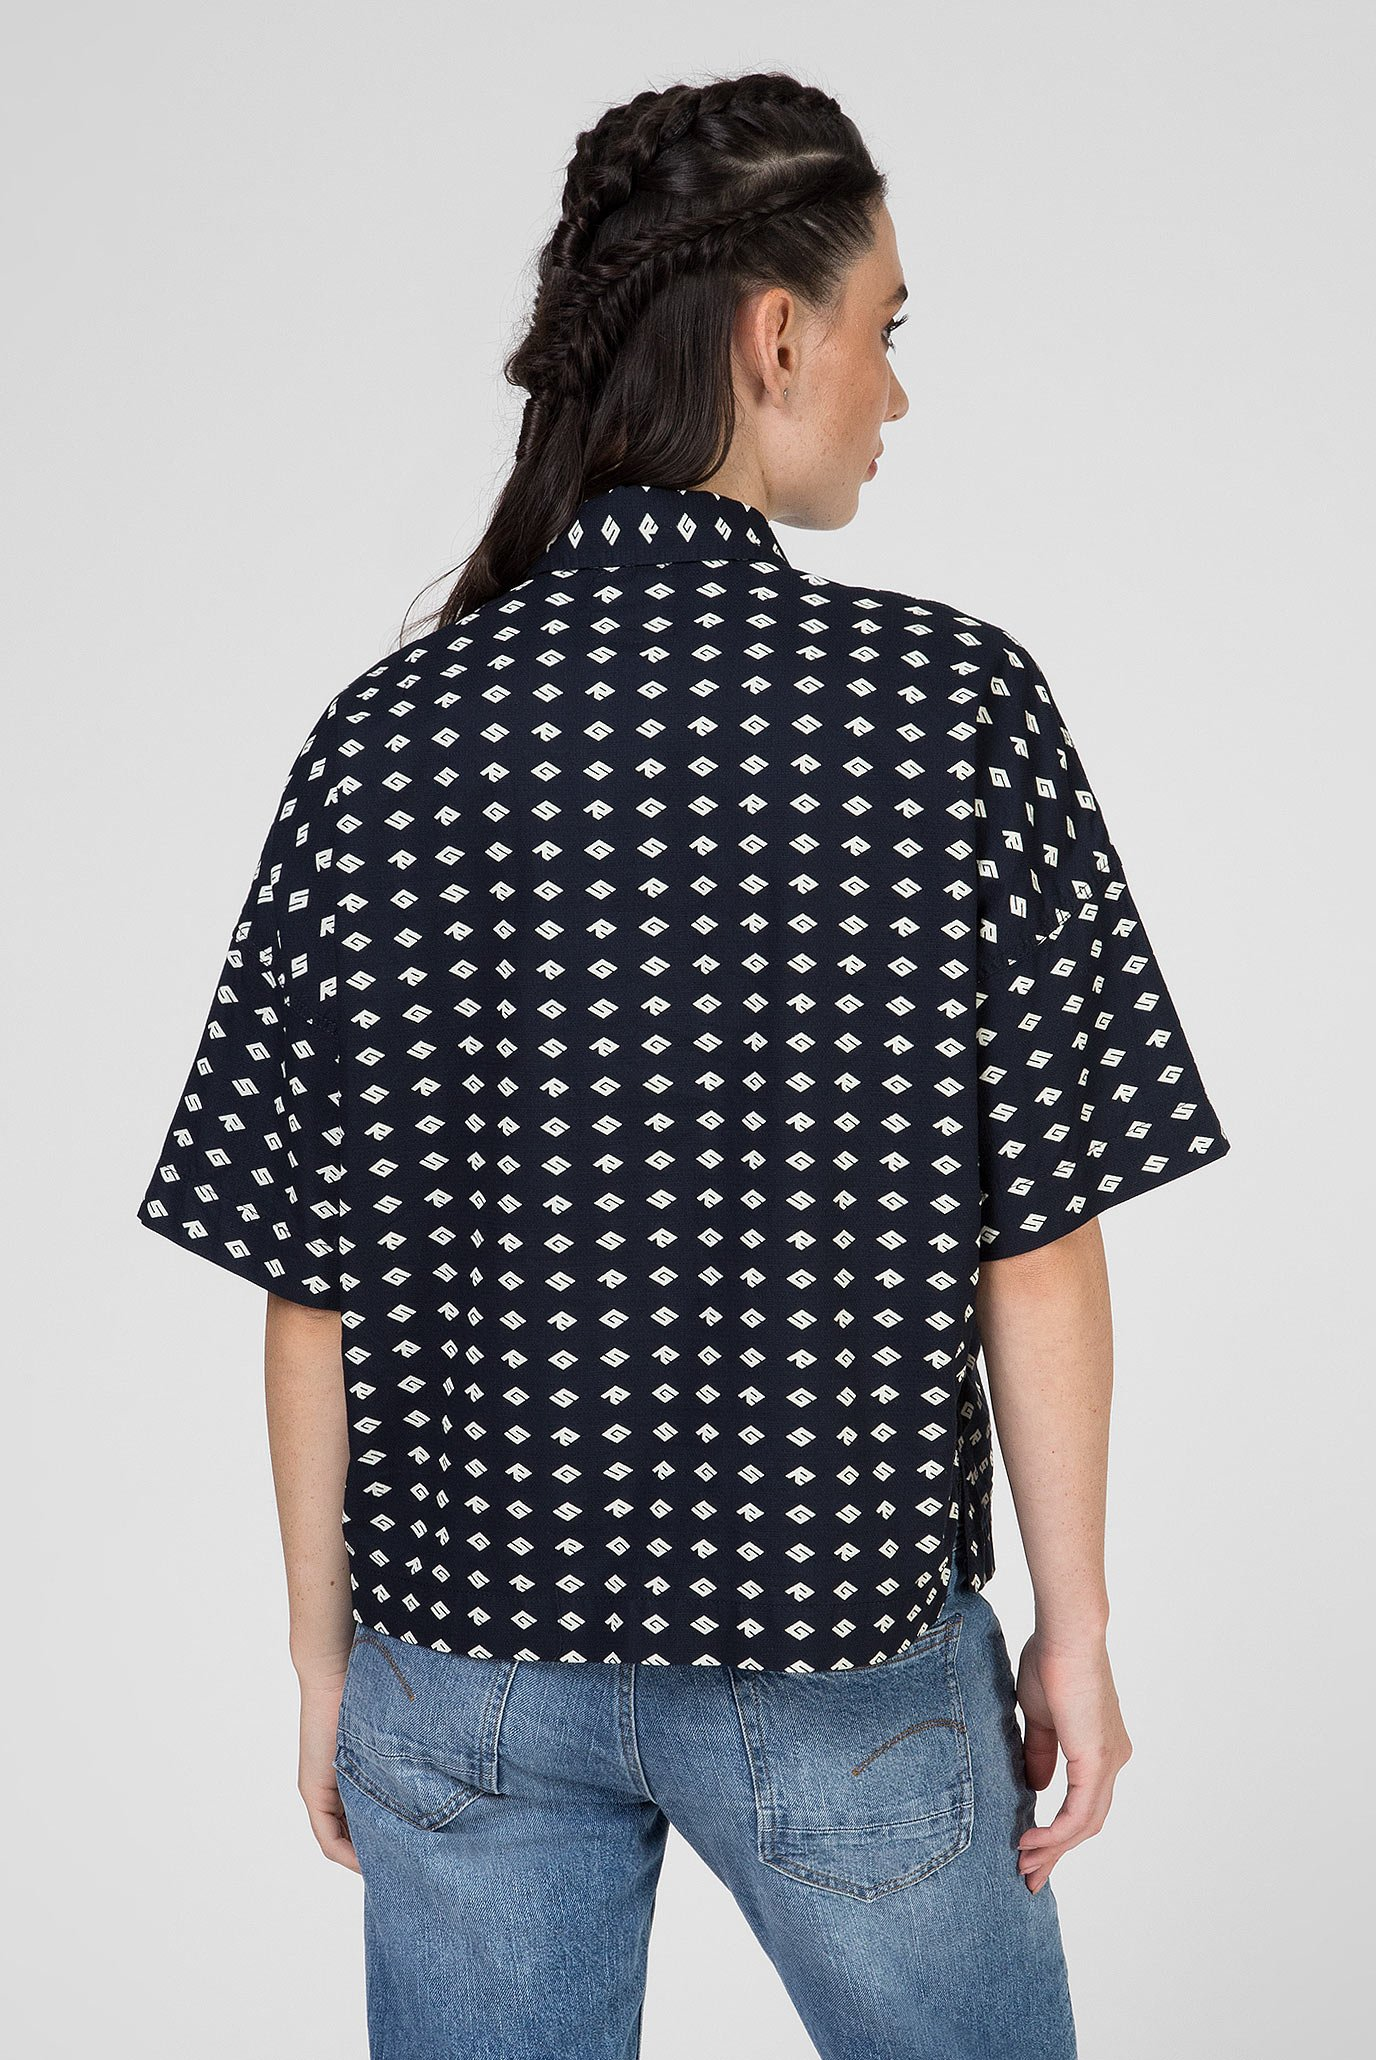 Купить Женская темно-синяя рубашка Core polo wmn s\s G-Star RAW G-Star RAW D14164,B105 – Киев, Украина. Цены в интернет магазине MD Fashion